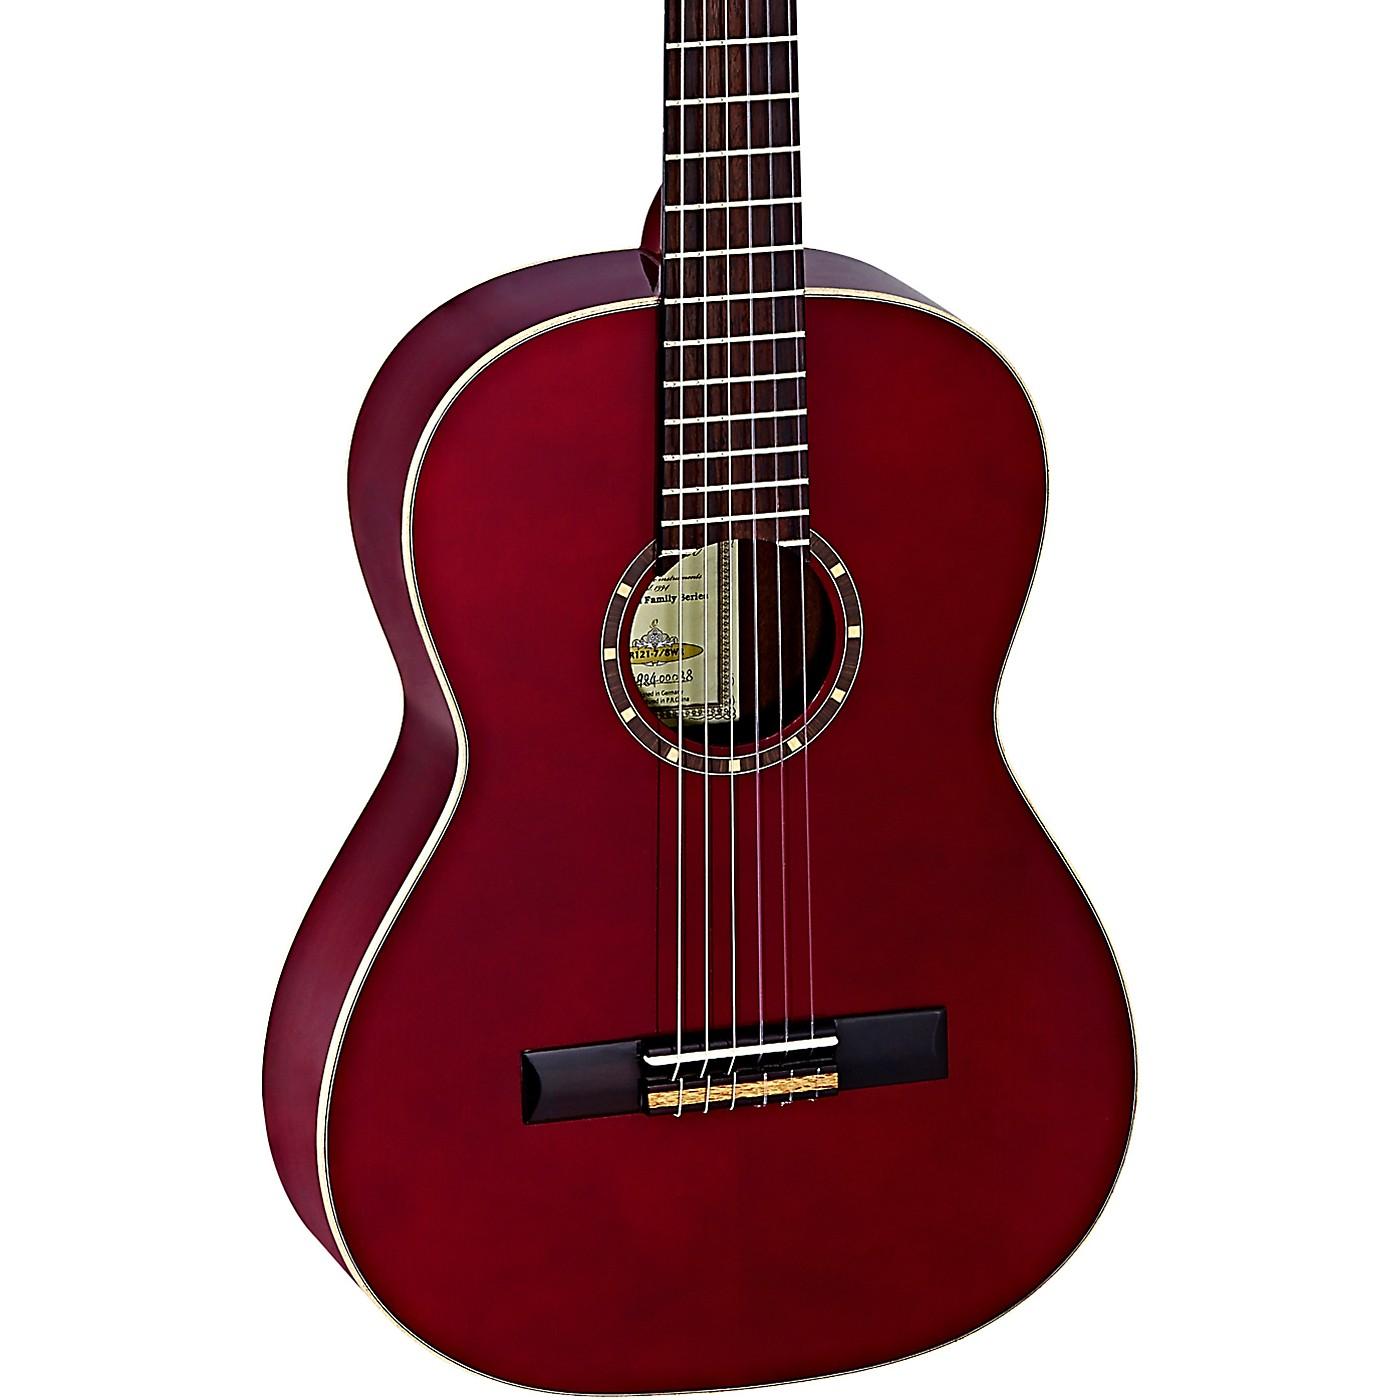 Ortega Family Series R121-7/8WR 7/8 Size Classical Guitar thumbnail